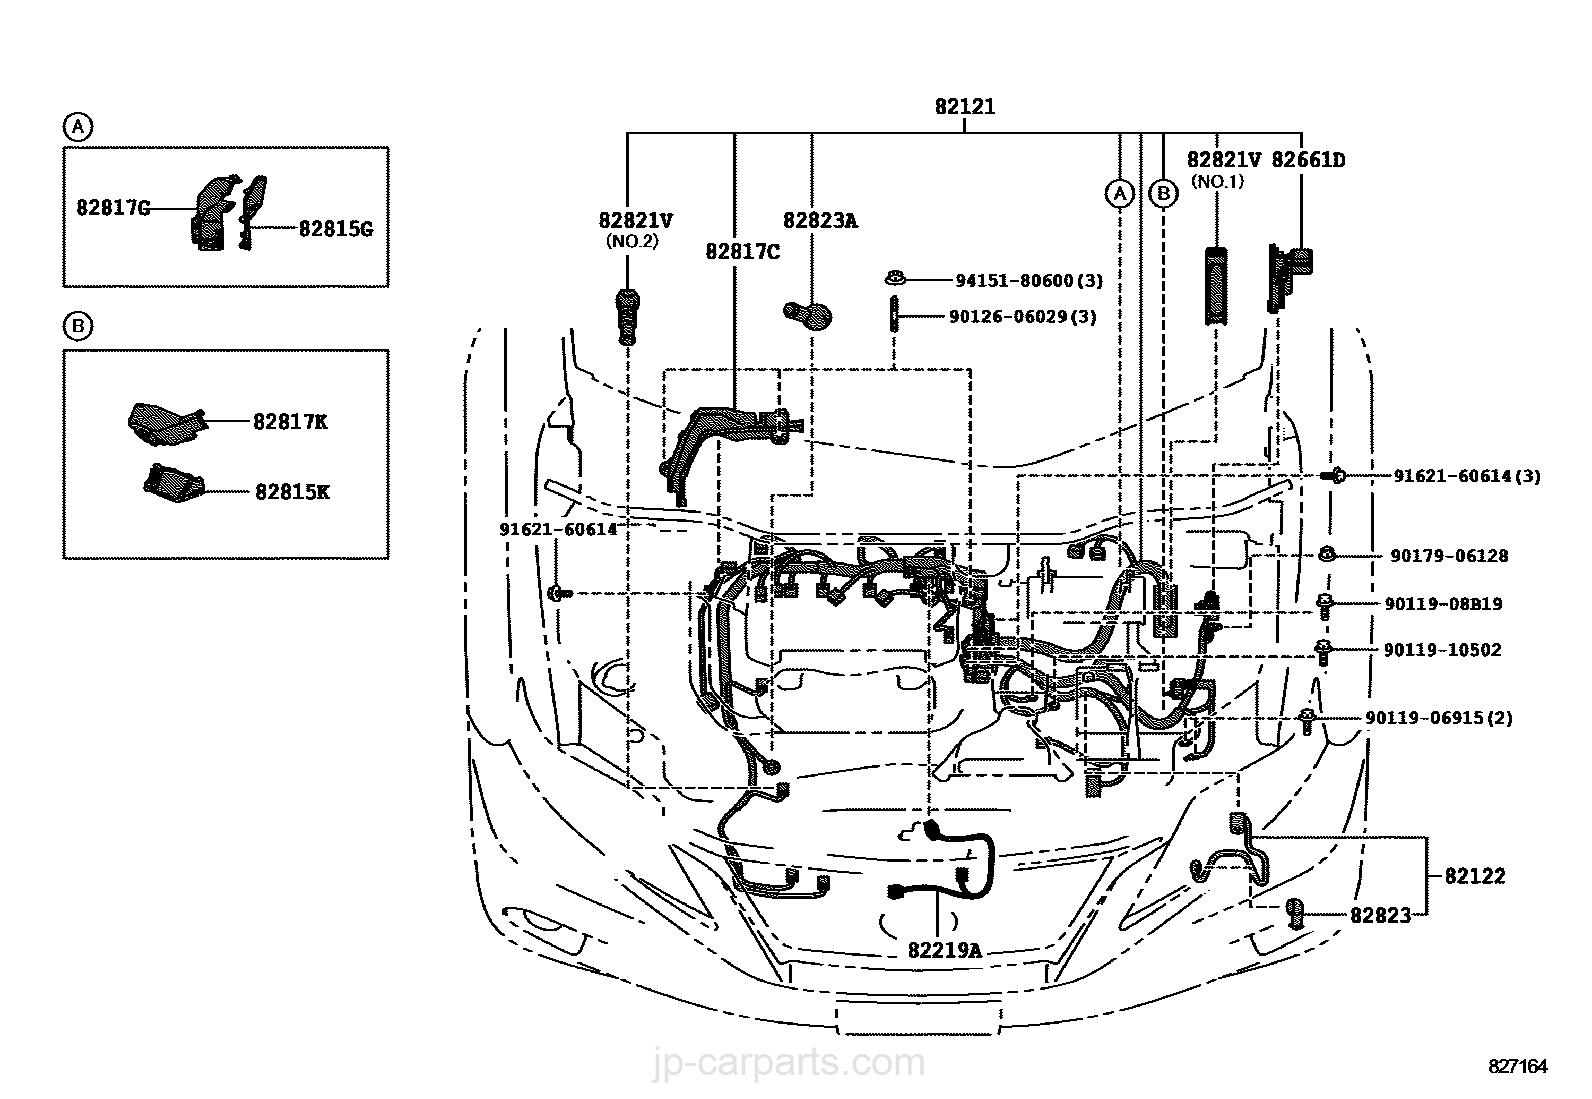 delorean spark plug wiring diagram   latest image for car engine